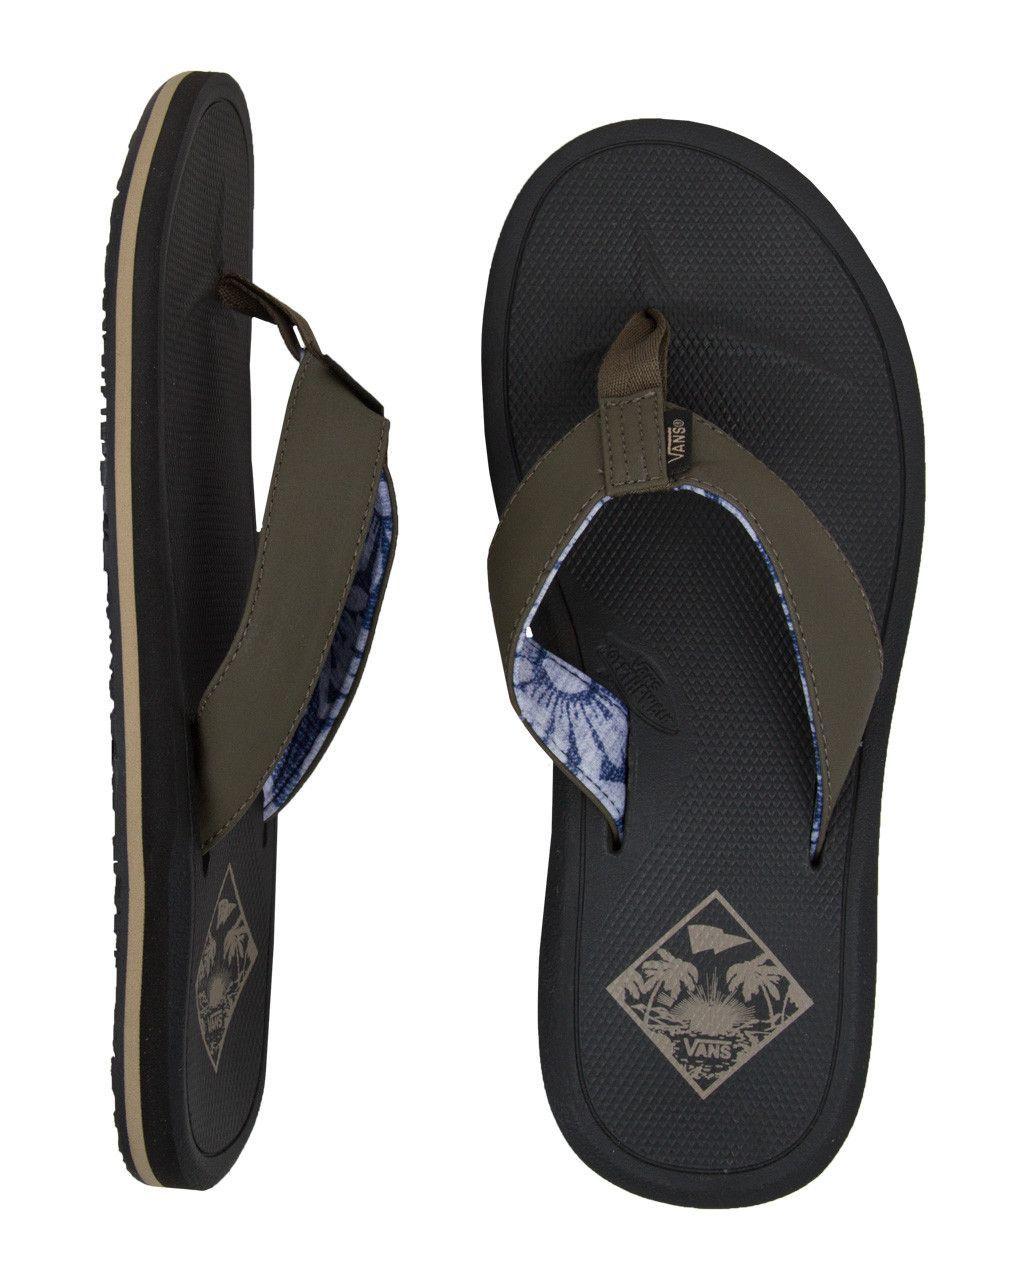 f481fe384b Vans Nexpa Synthetic Sandals - Joel Tudor Surf Collection | Vans ...